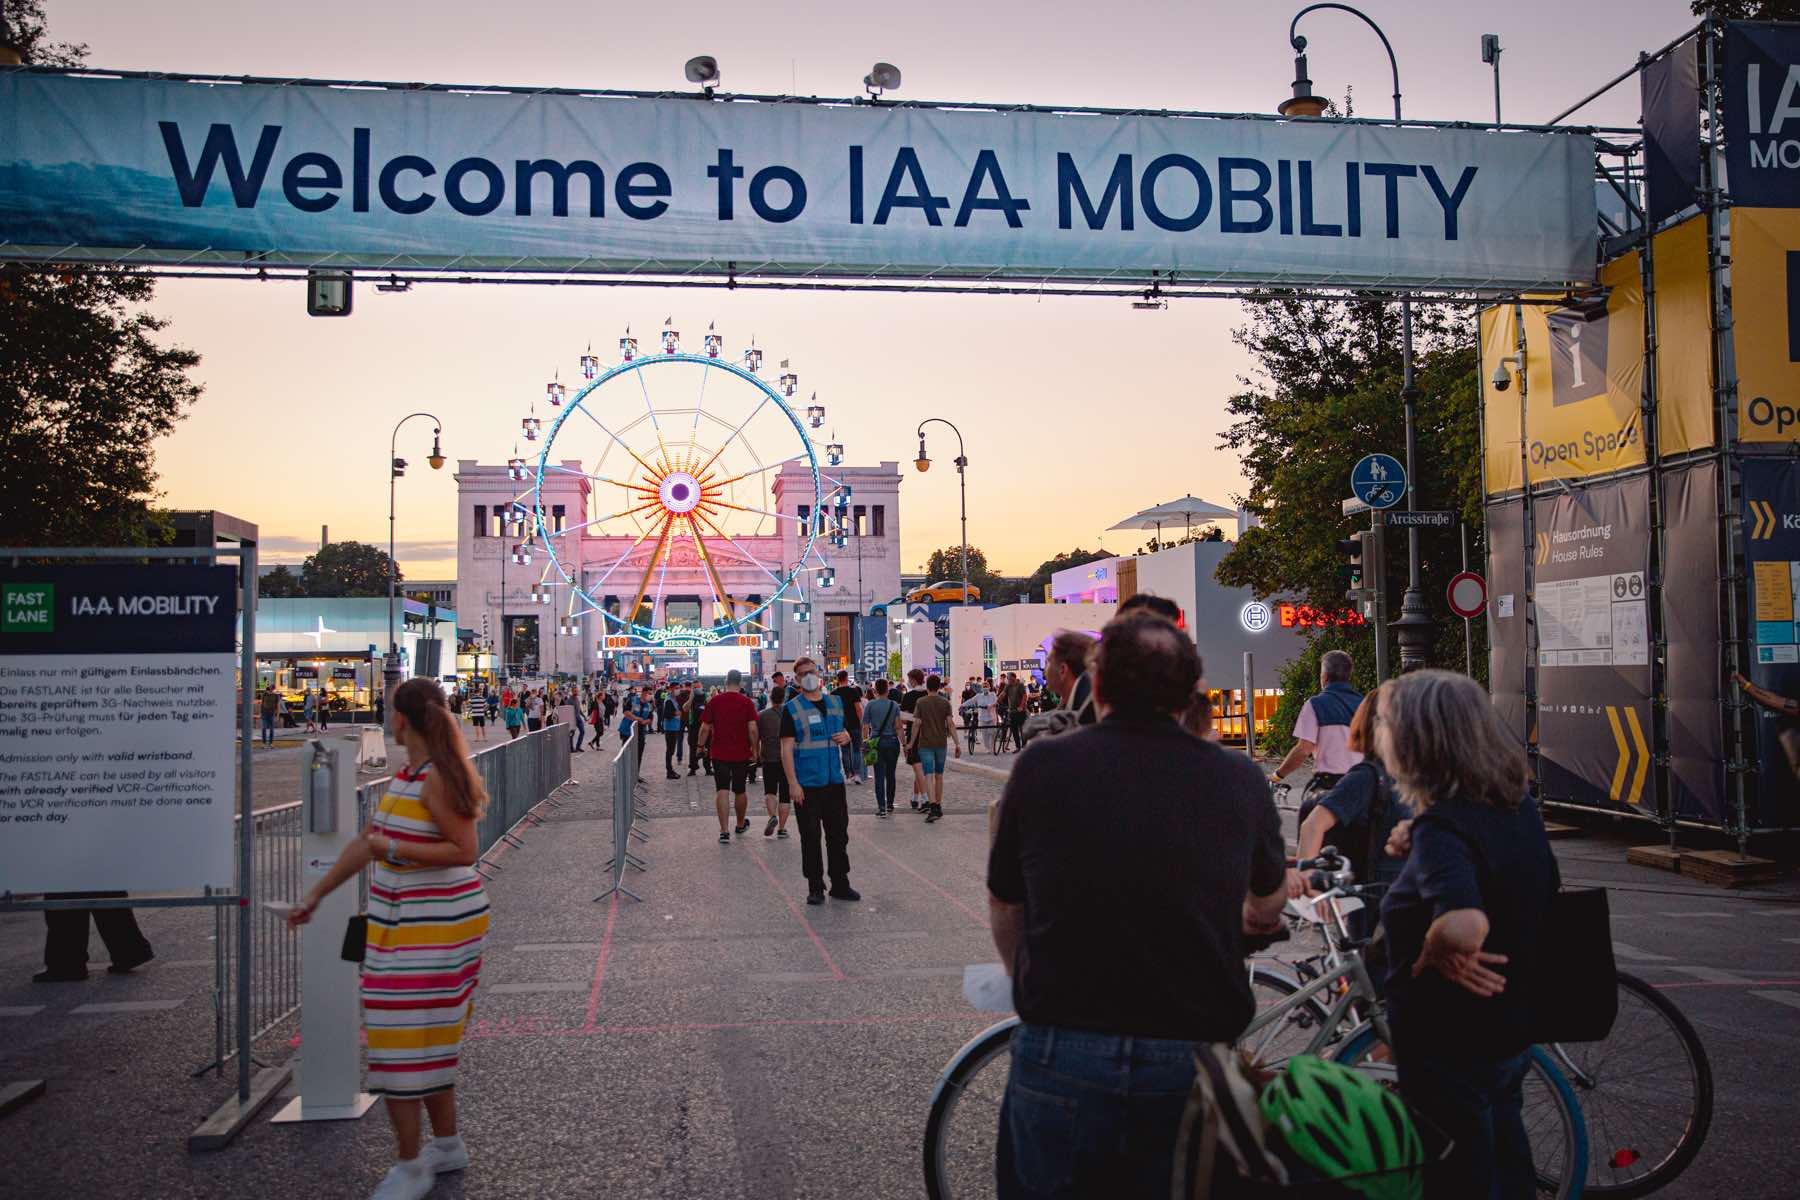 IAA Mobility 2021 in der Münchner Innenstadt